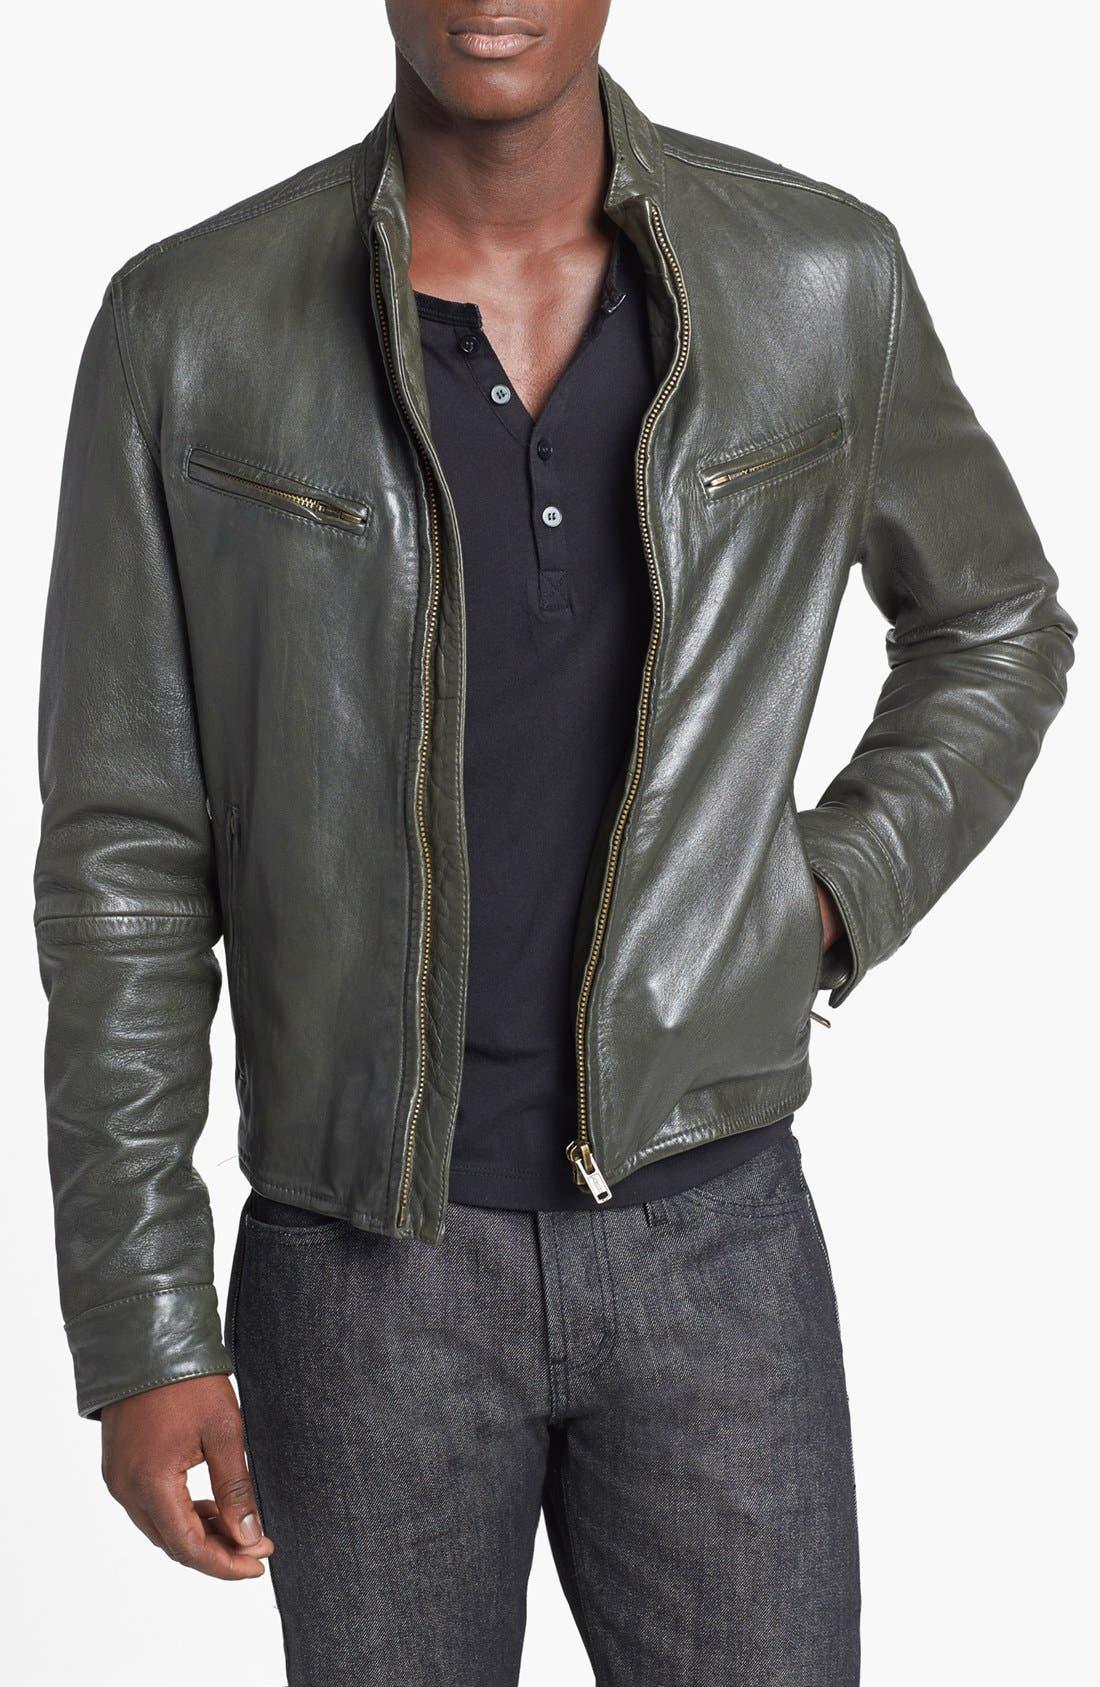 Alternate Image 1 Selected - Levi's® Made & Crafted™ Leather Biker Jacket